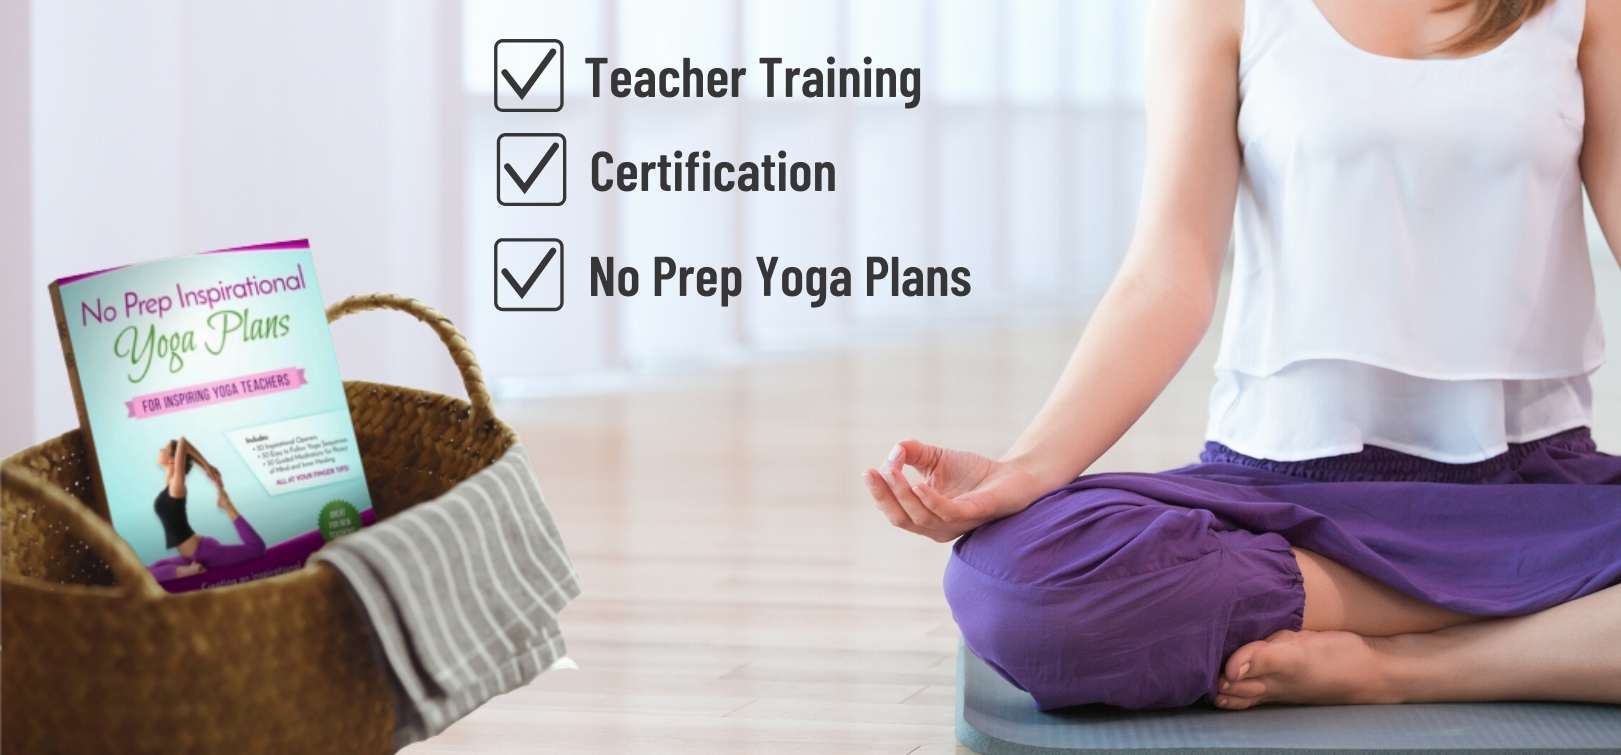 No Prep Yoga Plans Header